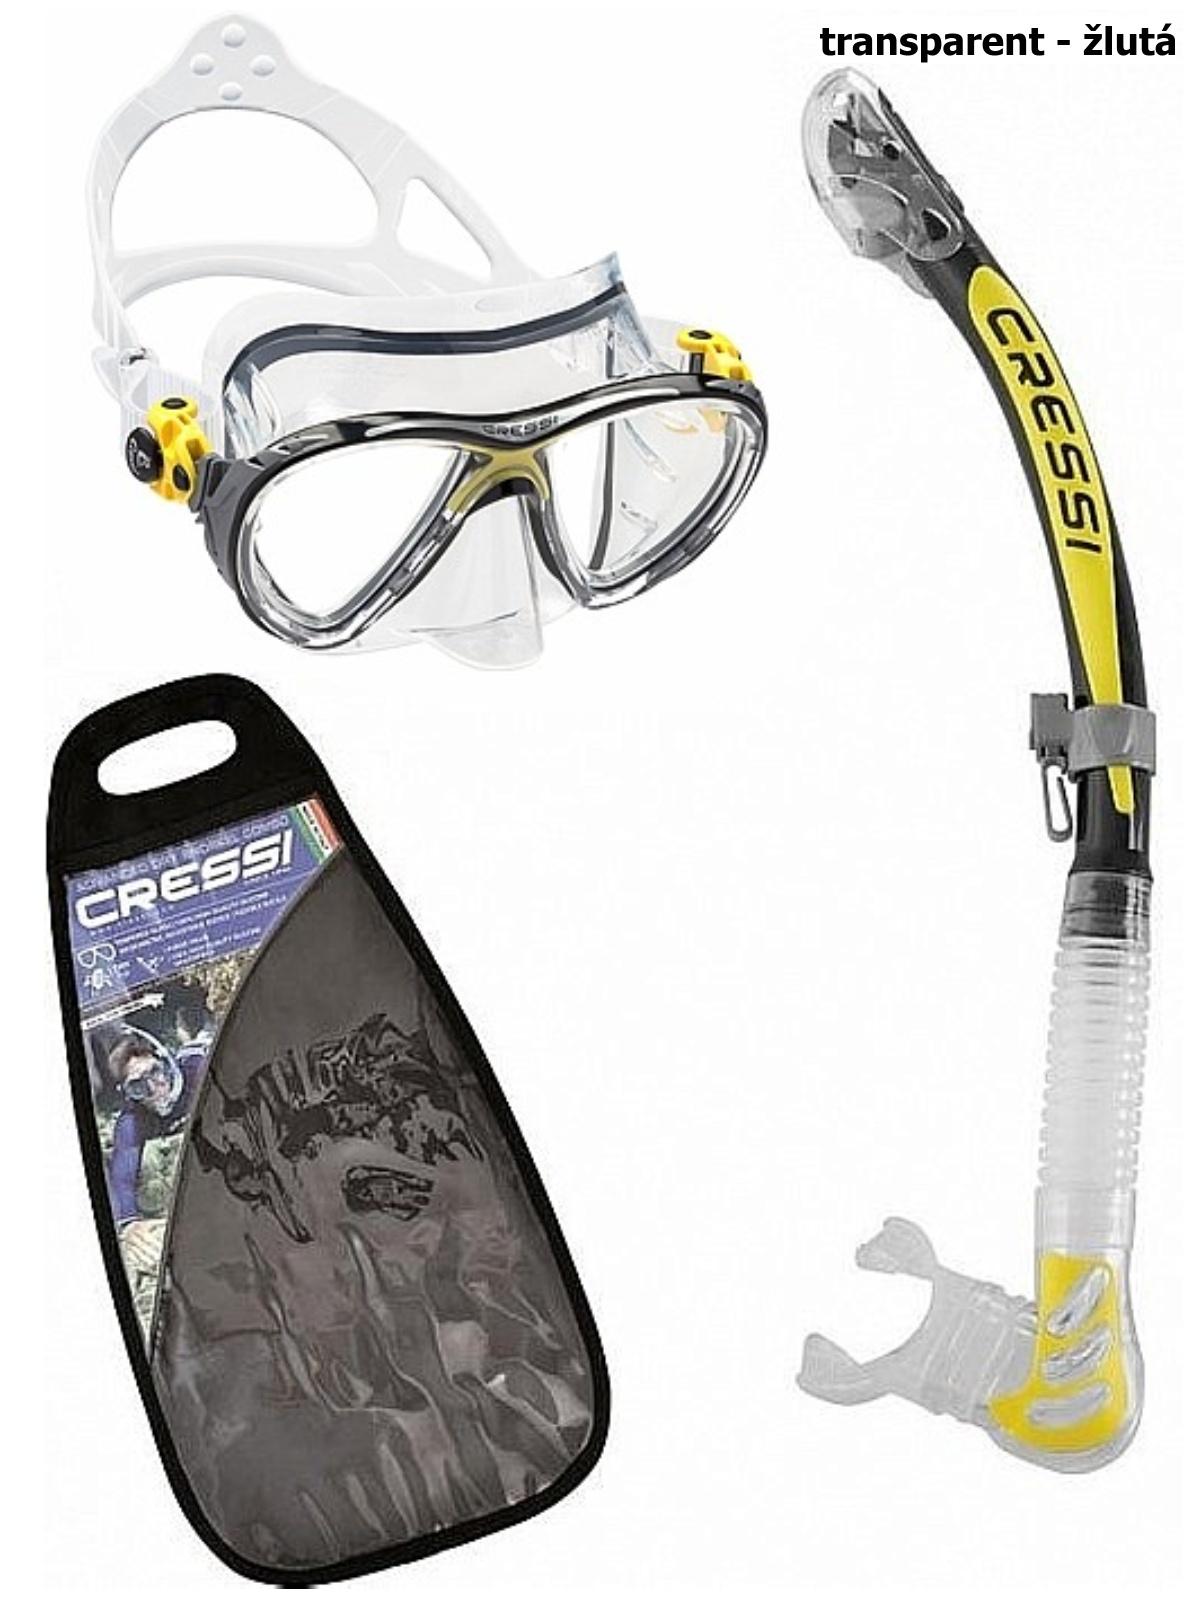 Potápačský set CRESSI Big Eyes+Alpha Ultra Dry - transparent žltý